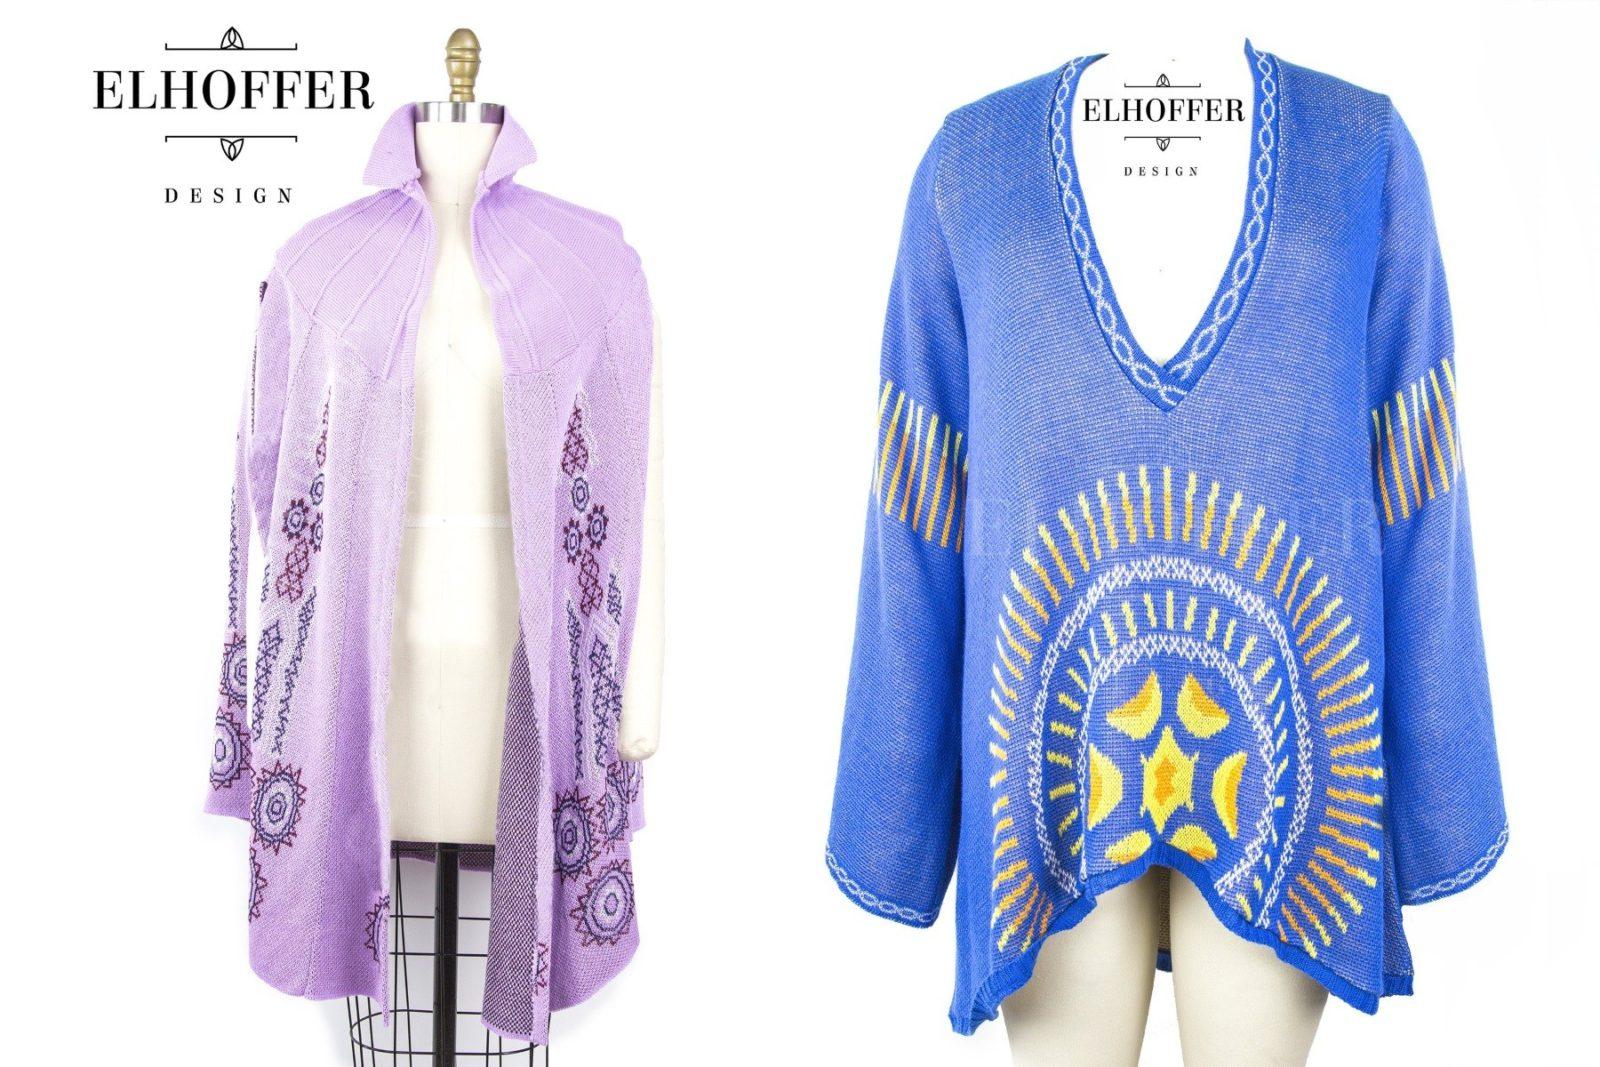 New pre-order items from Elhoffer Design!